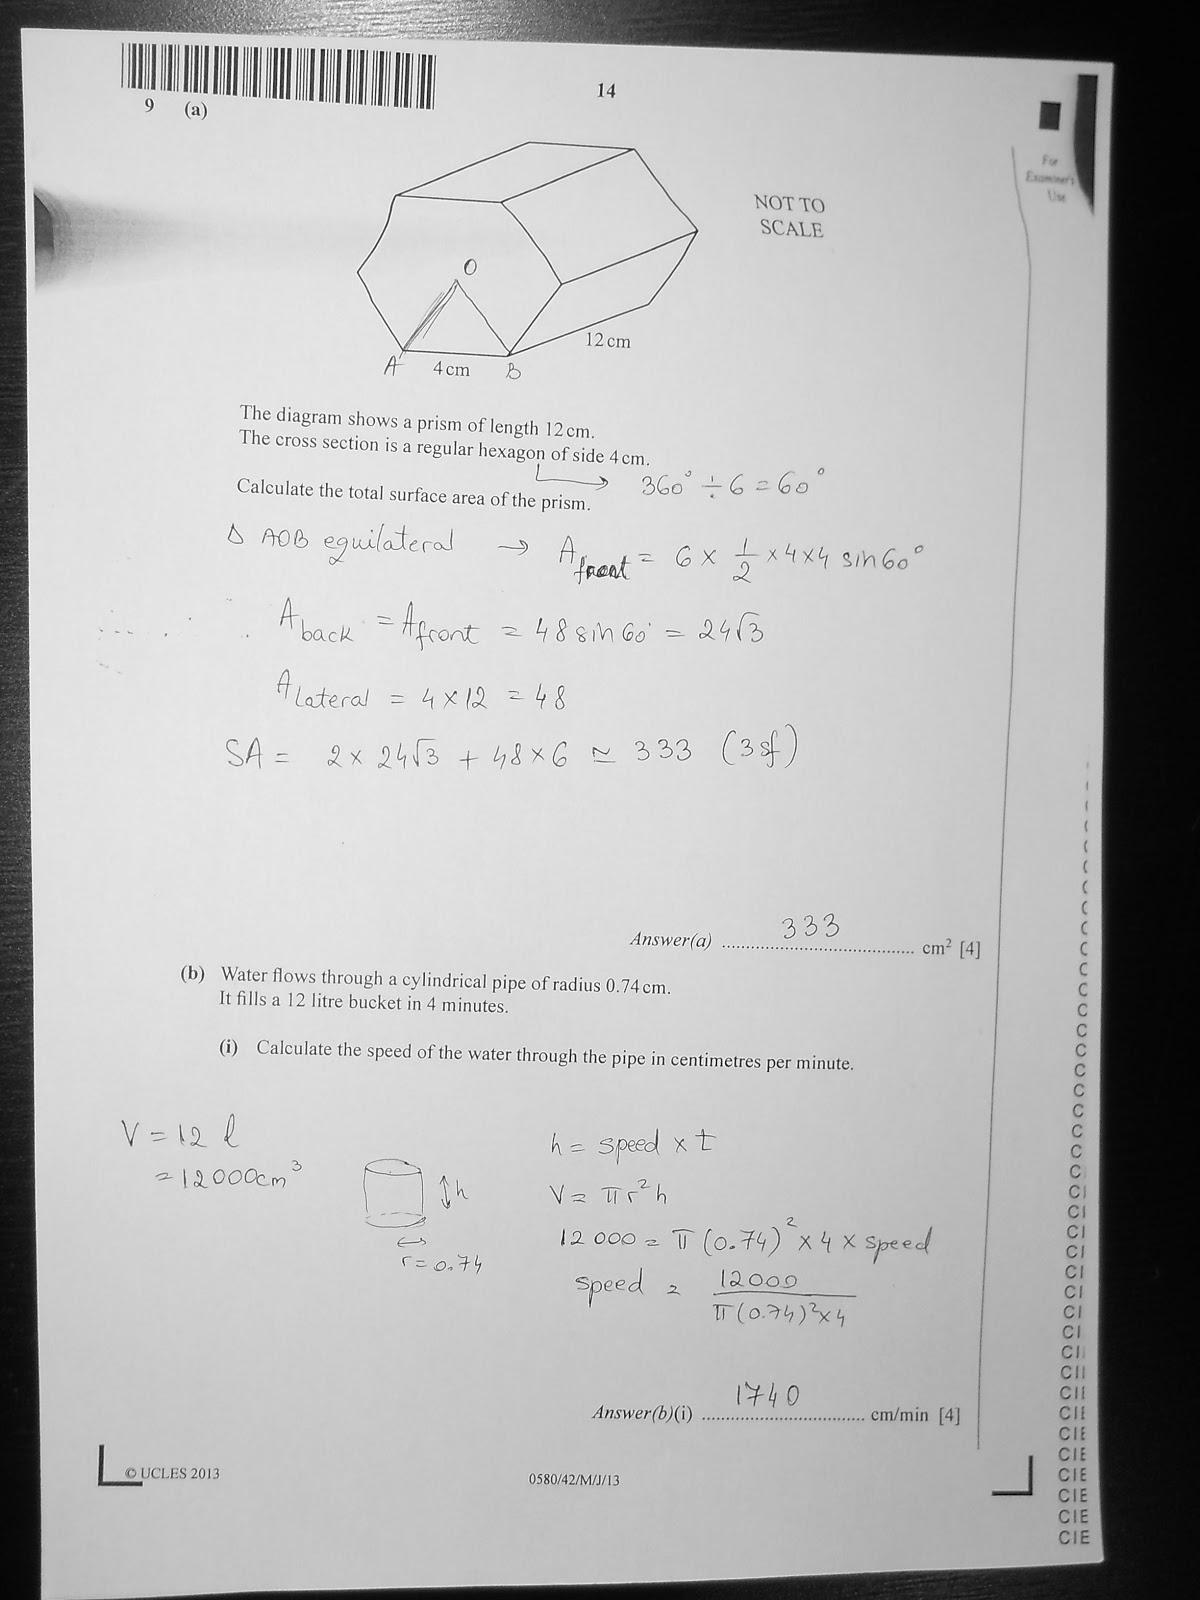 igcse mathematics past papers 2013